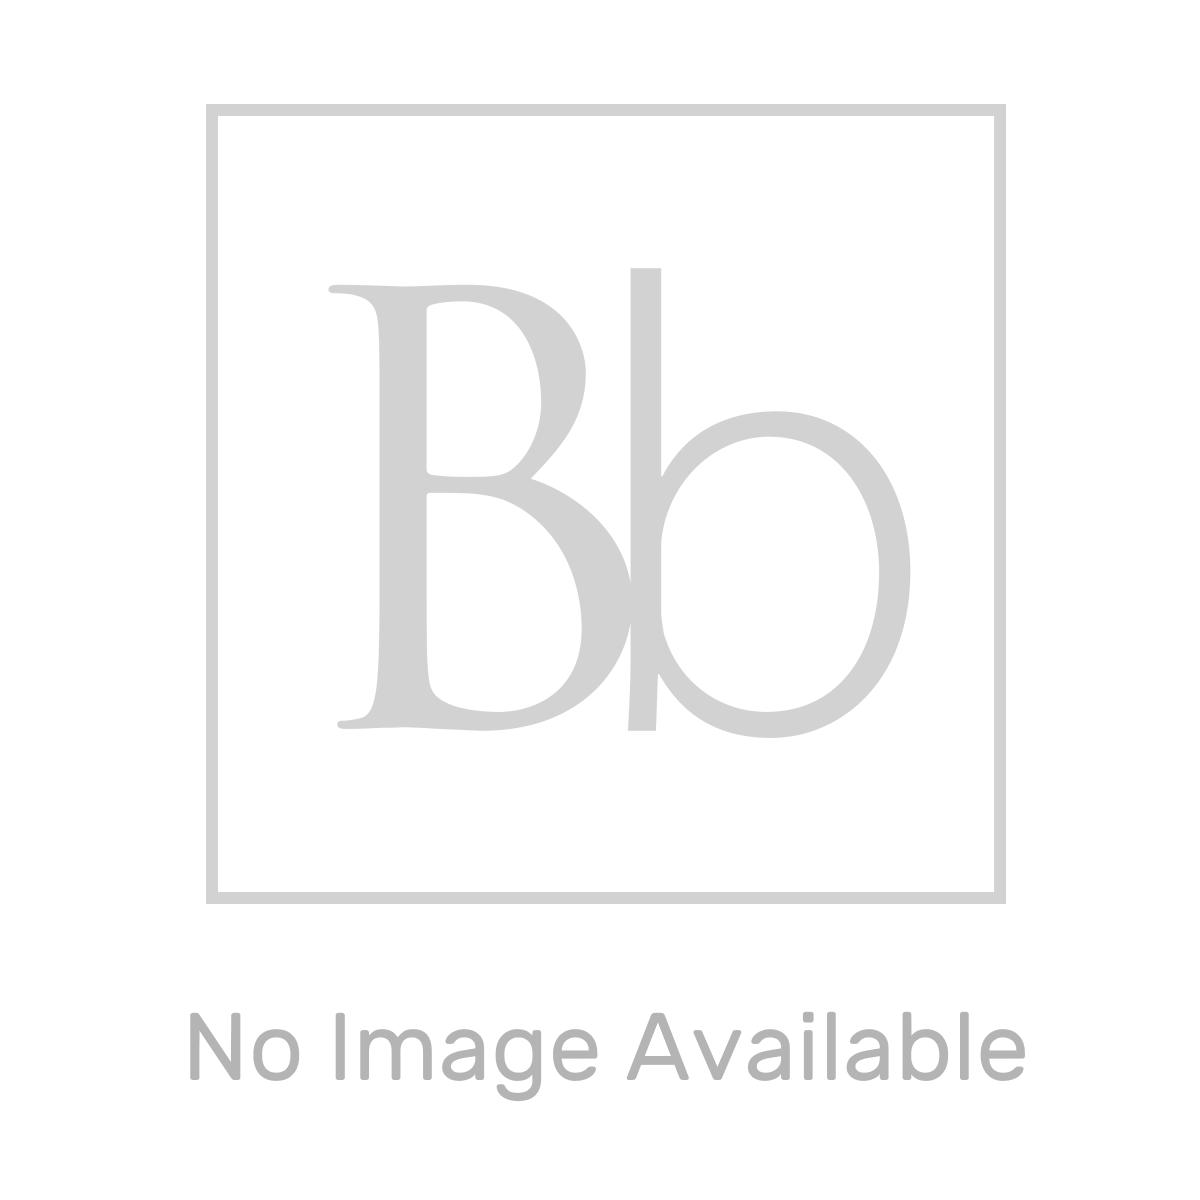 Tavistock Meridian Plain End Bath Panel 700mm in White